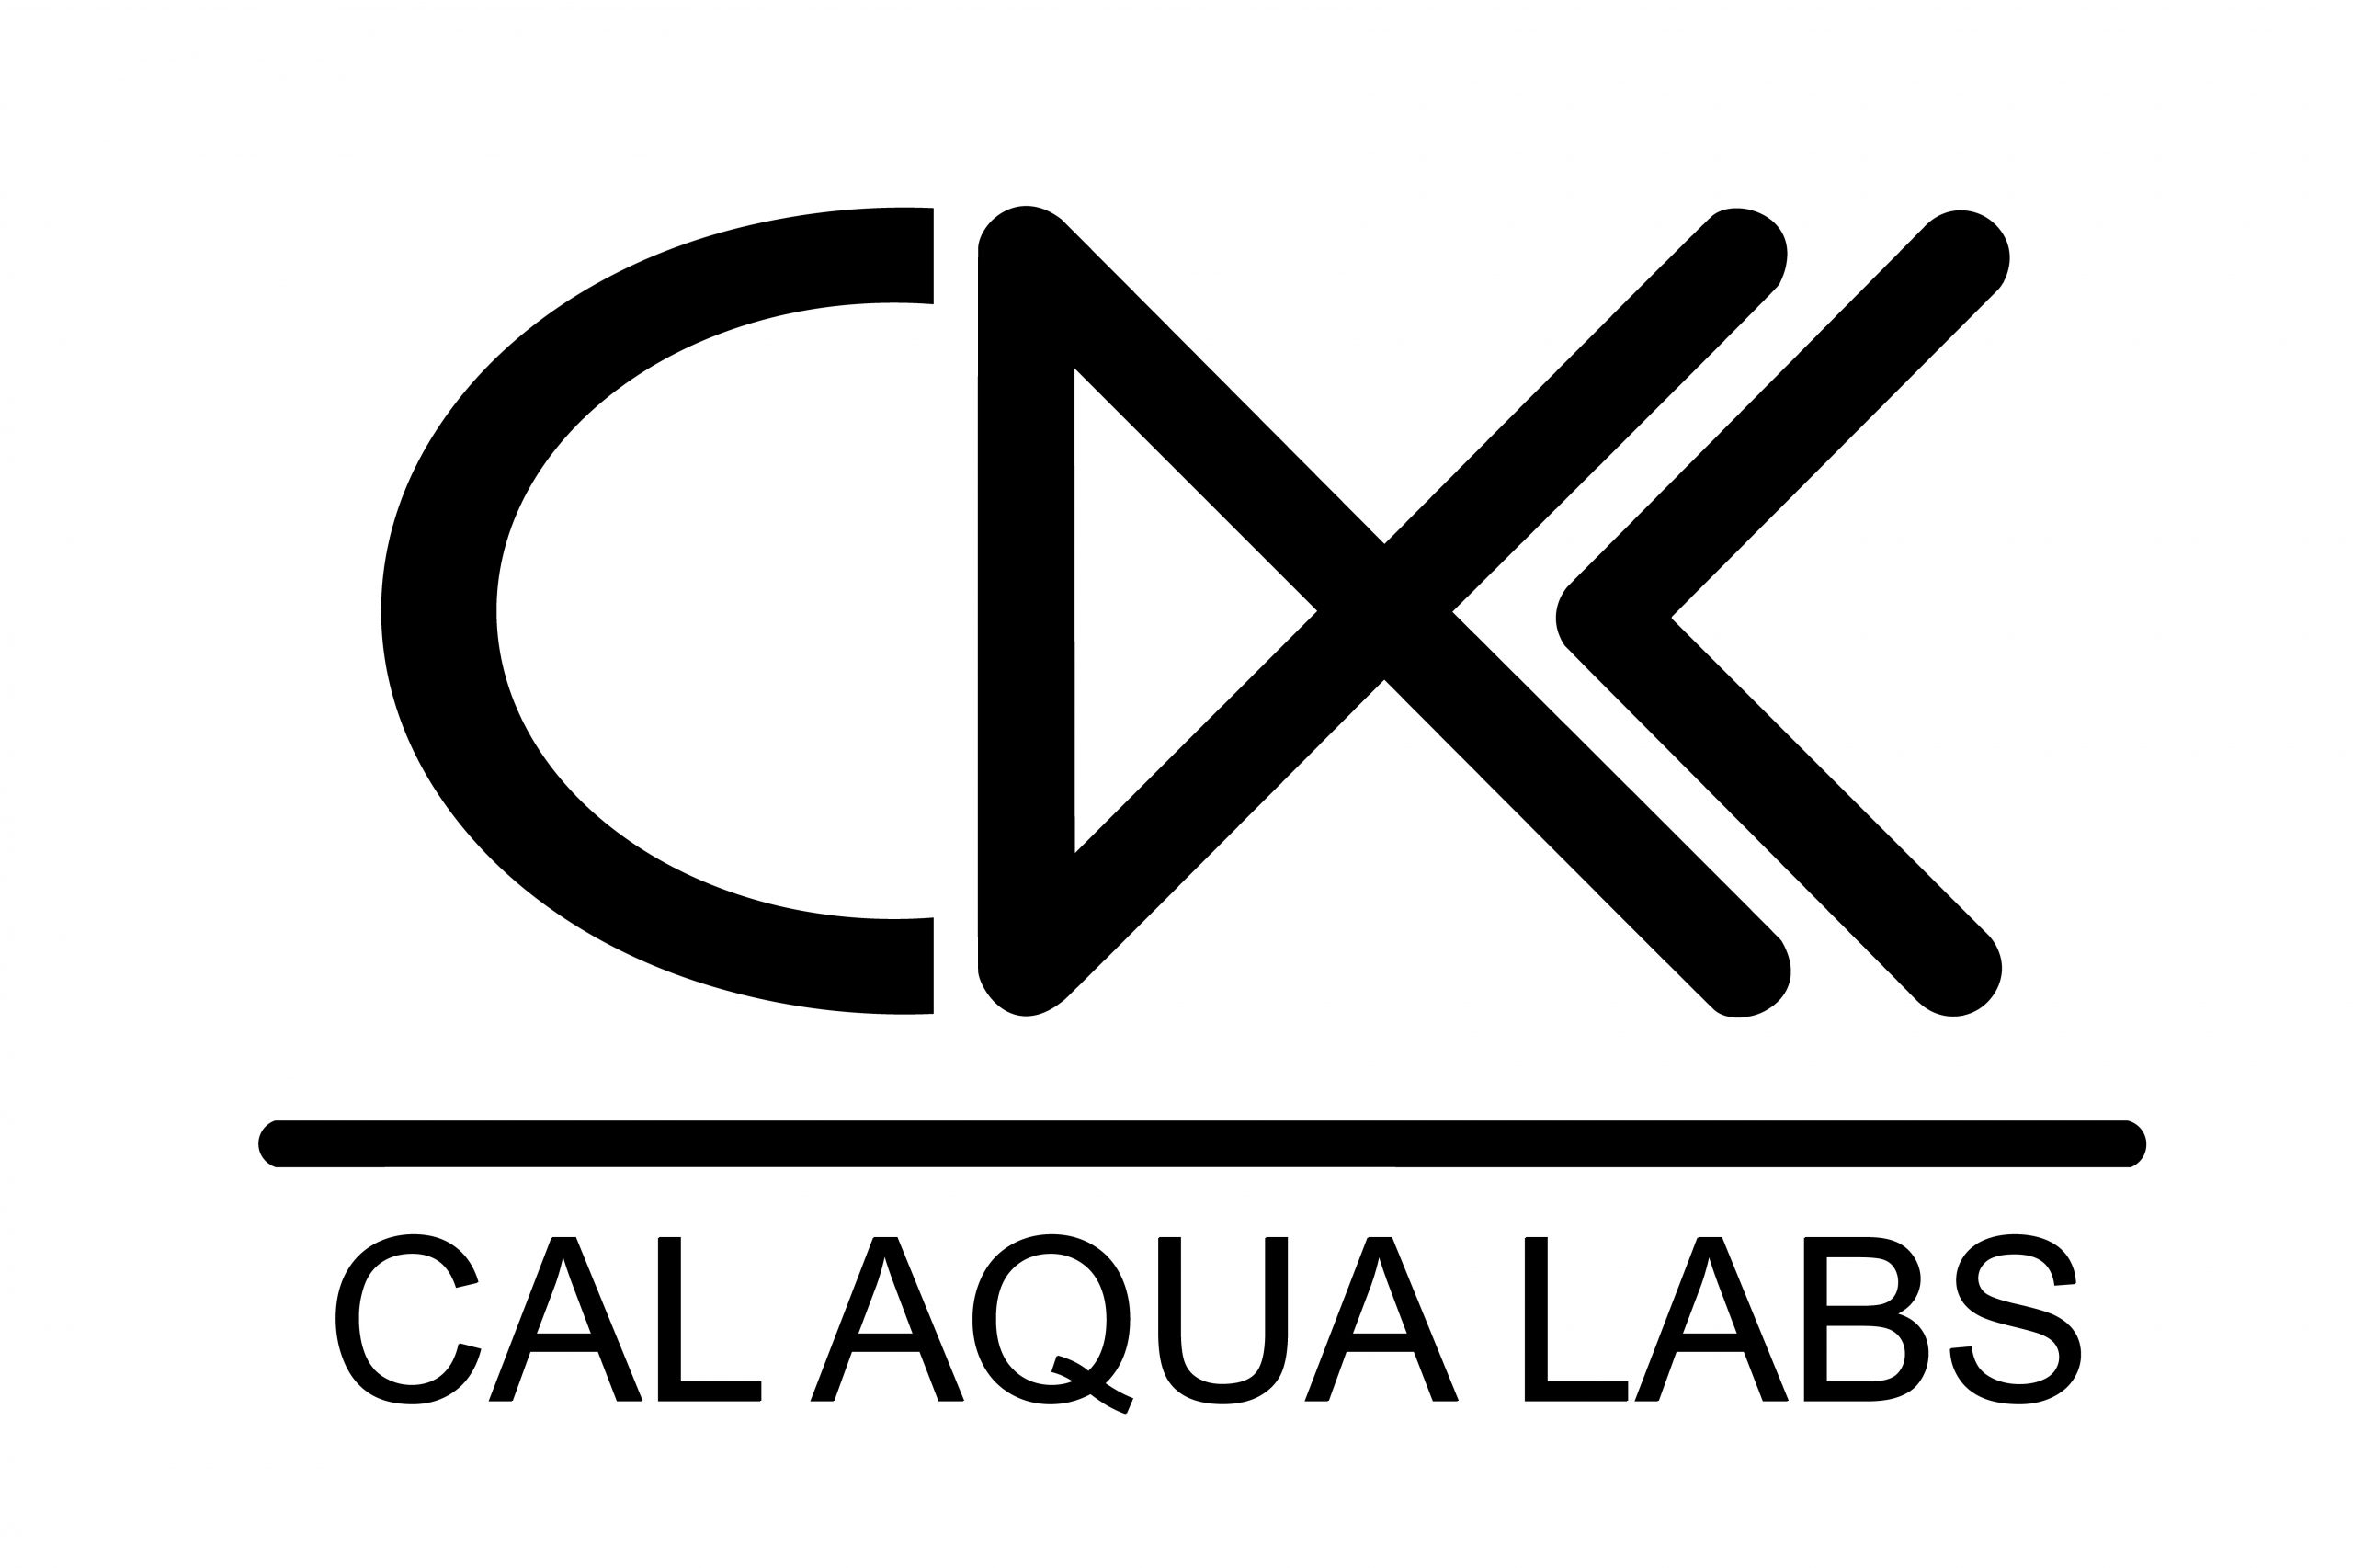 CAL logo_XXXL_AI.ai